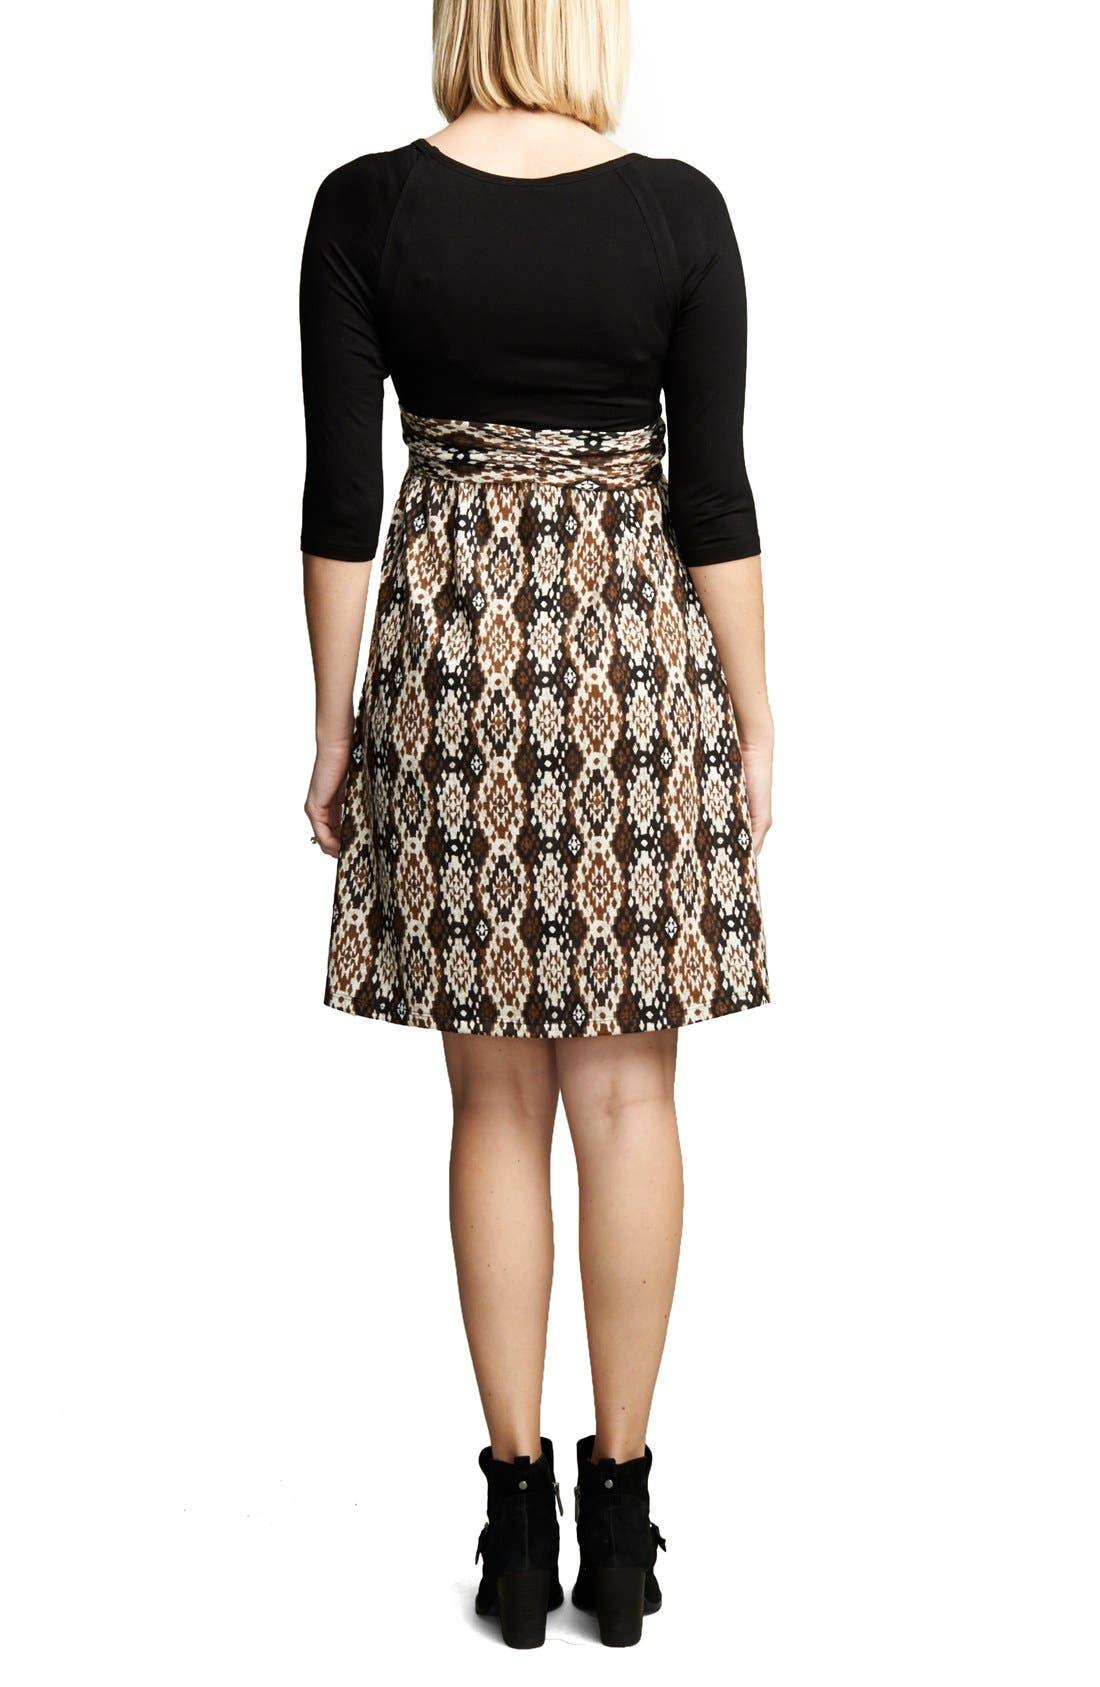 Ikat Print Tie Front Dress,                             Alternate thumbnail 2, color,                             Black/Ikat Print